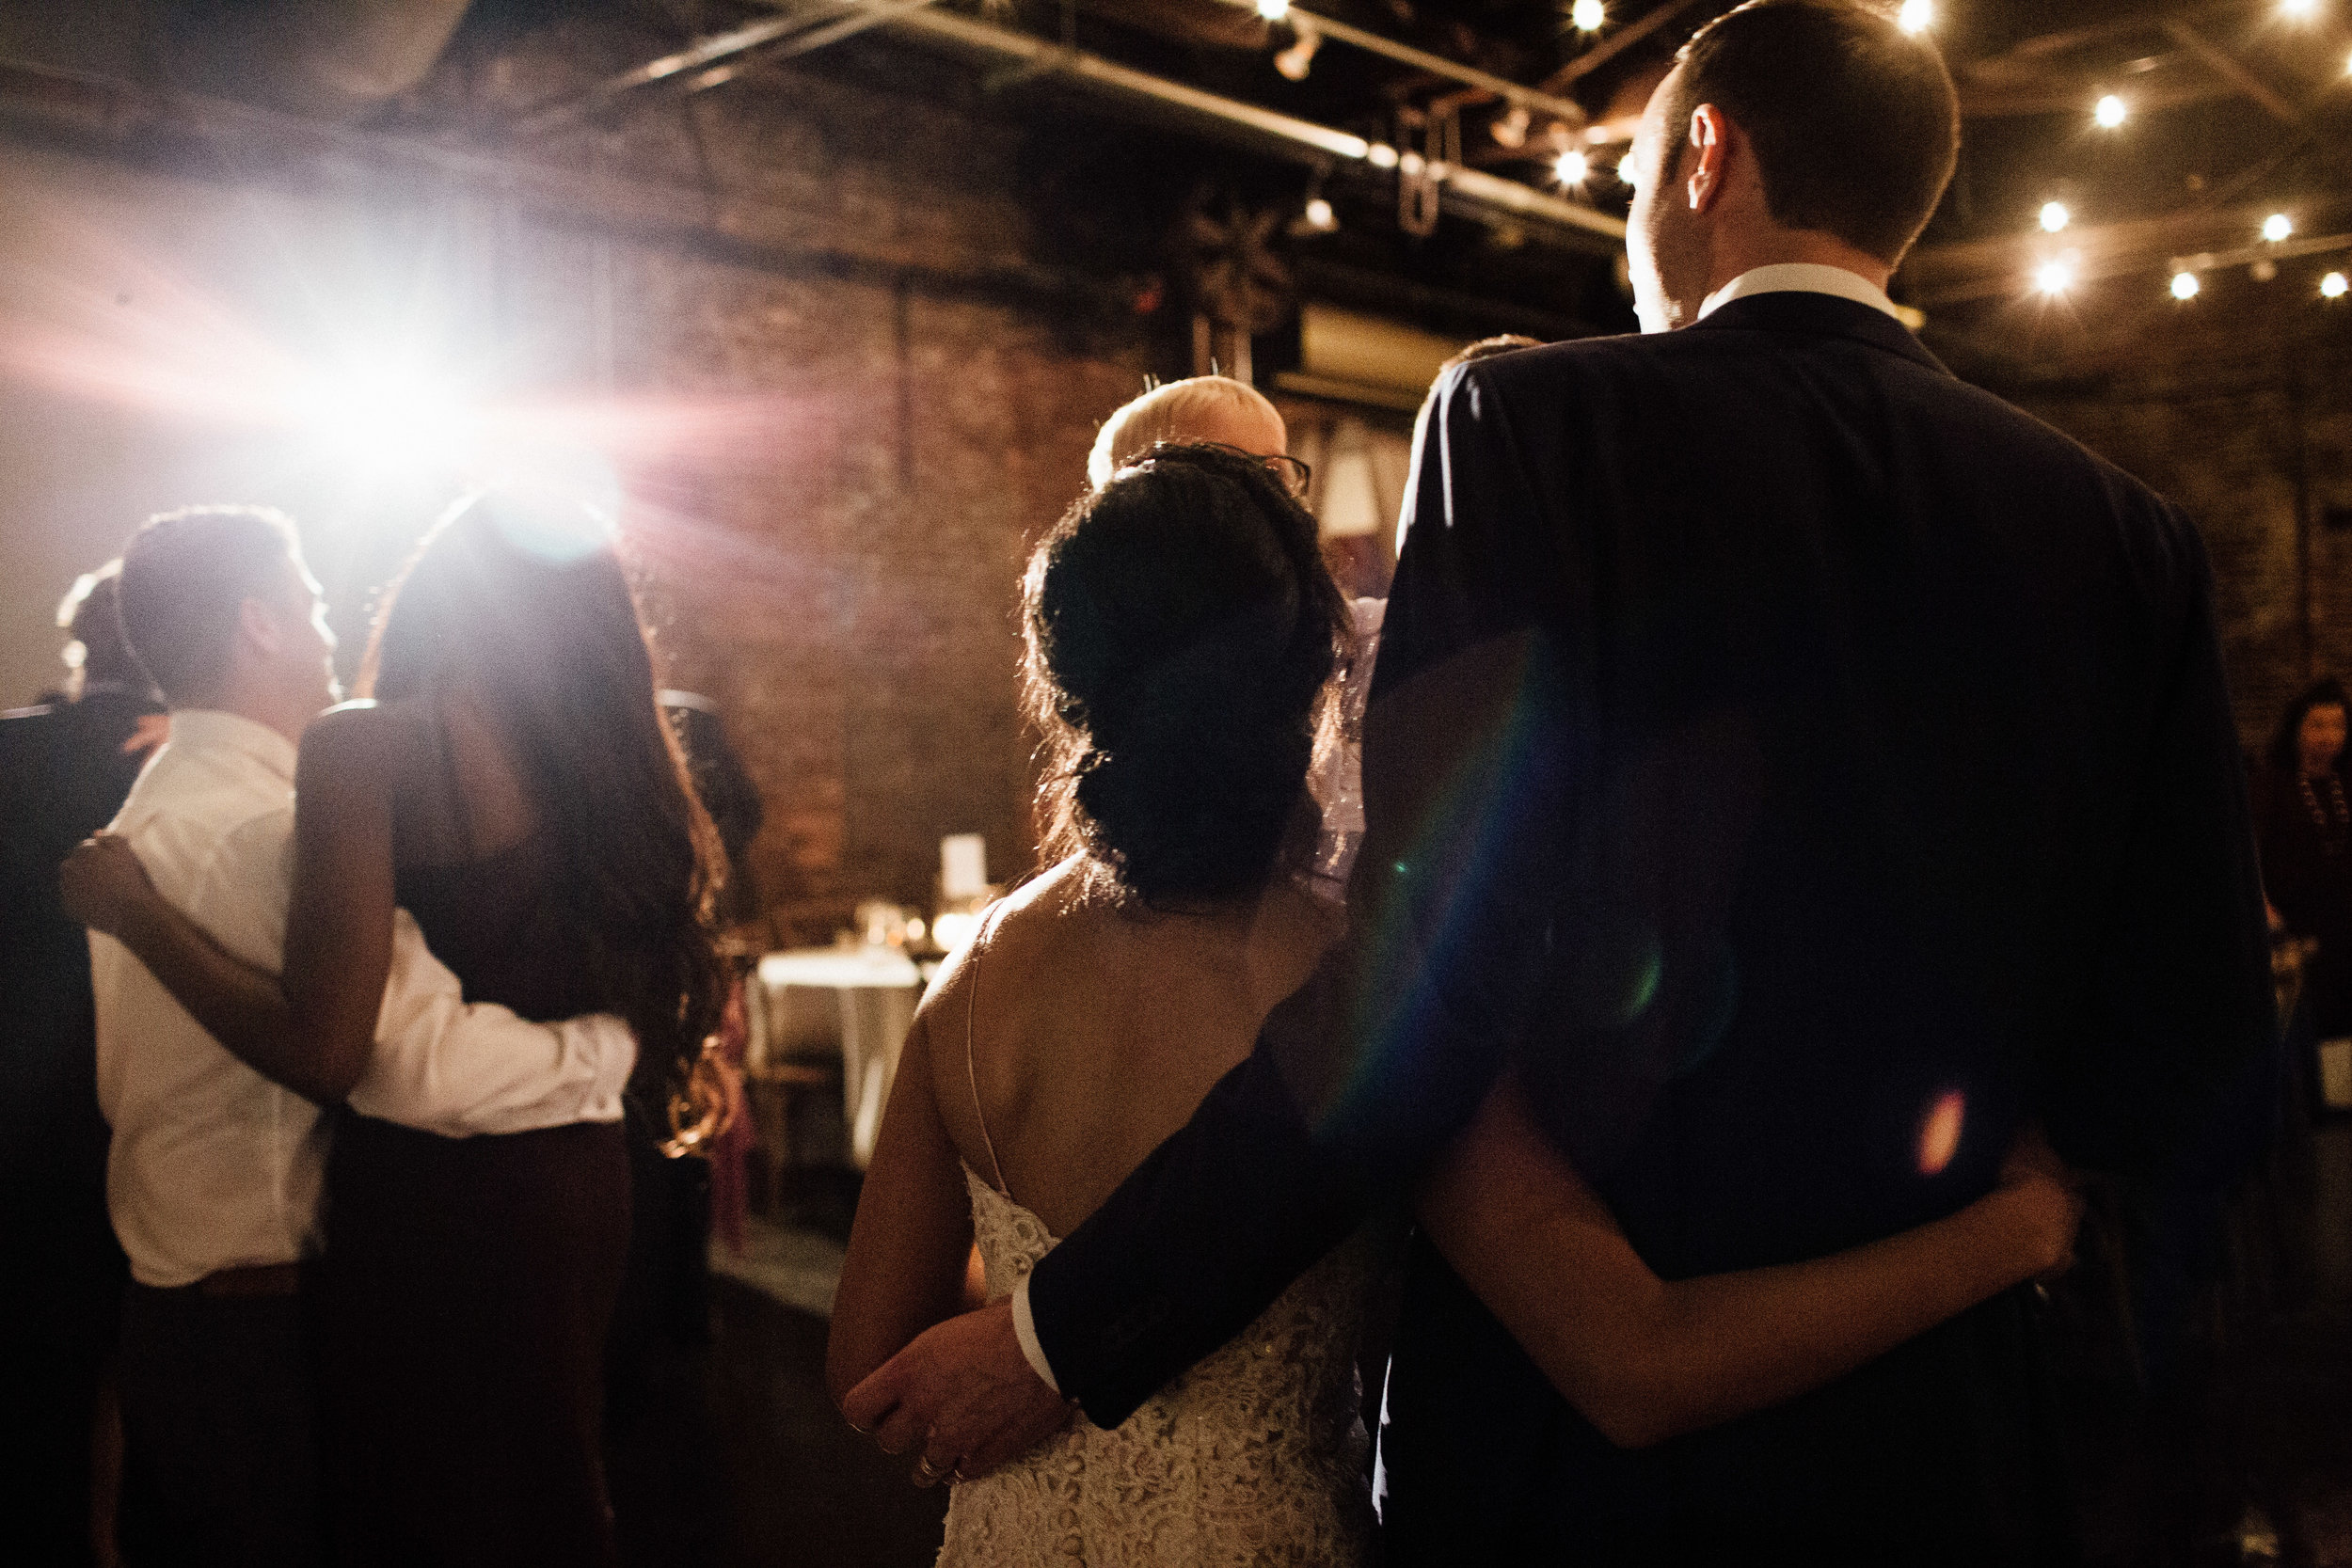 king_plow_atlanta_wedding_art_gallery_modern_lifestyle_documentary_2015.jpg